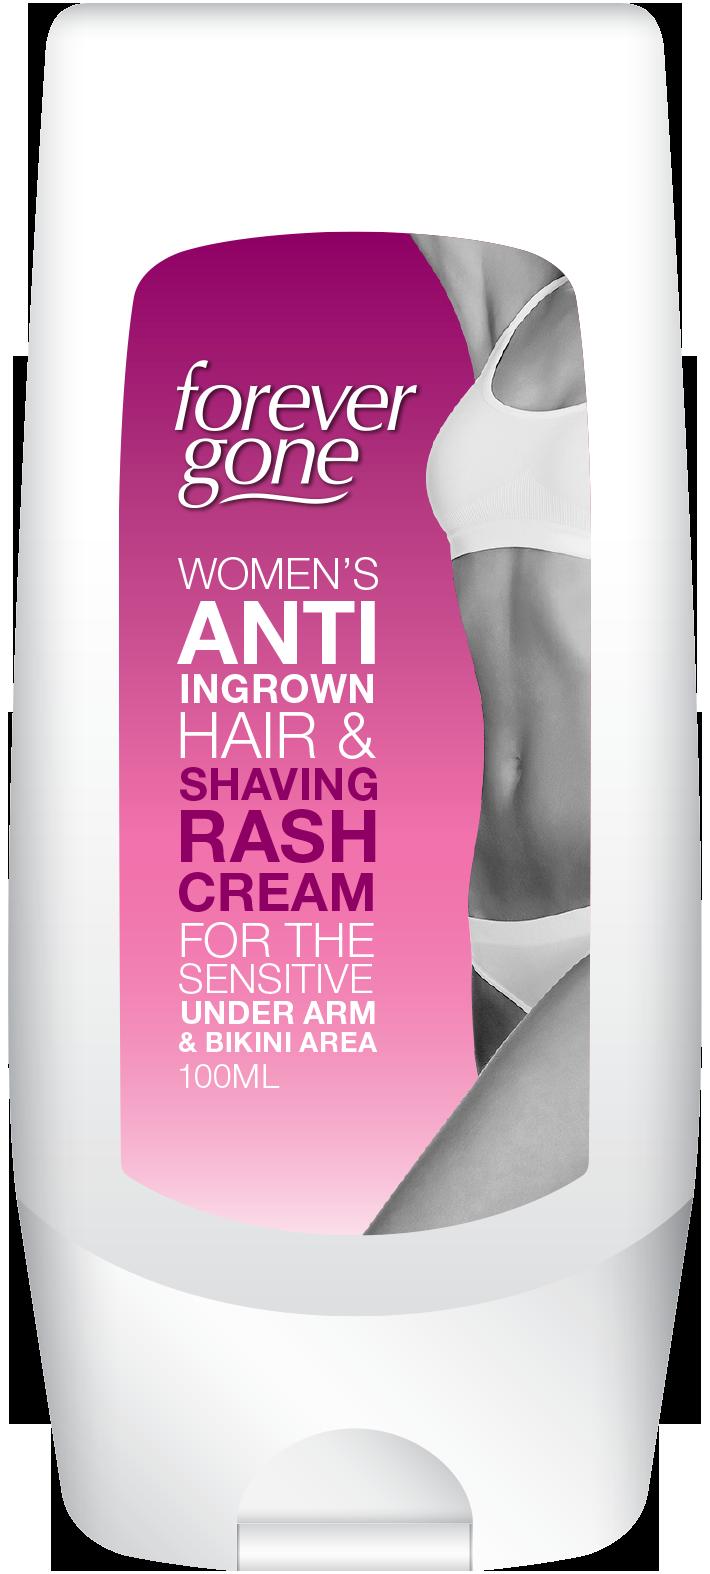 how to stop bikini shaving rash